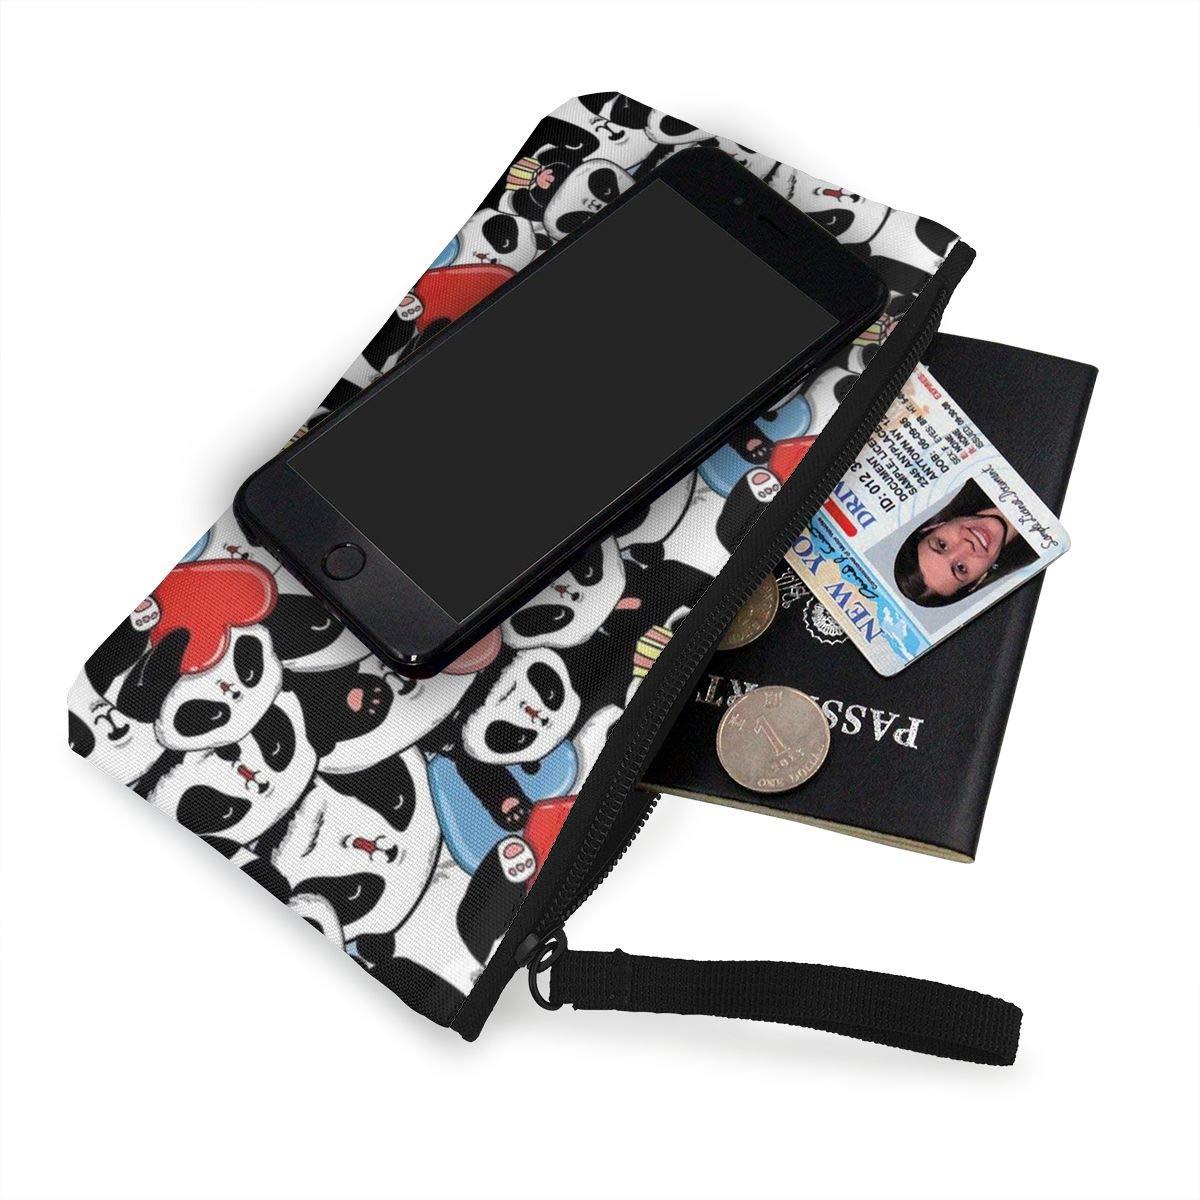 Coin Pouch Cute Panda Canvas Coin Purse Cellphone Card Bag With Handle And Zipper